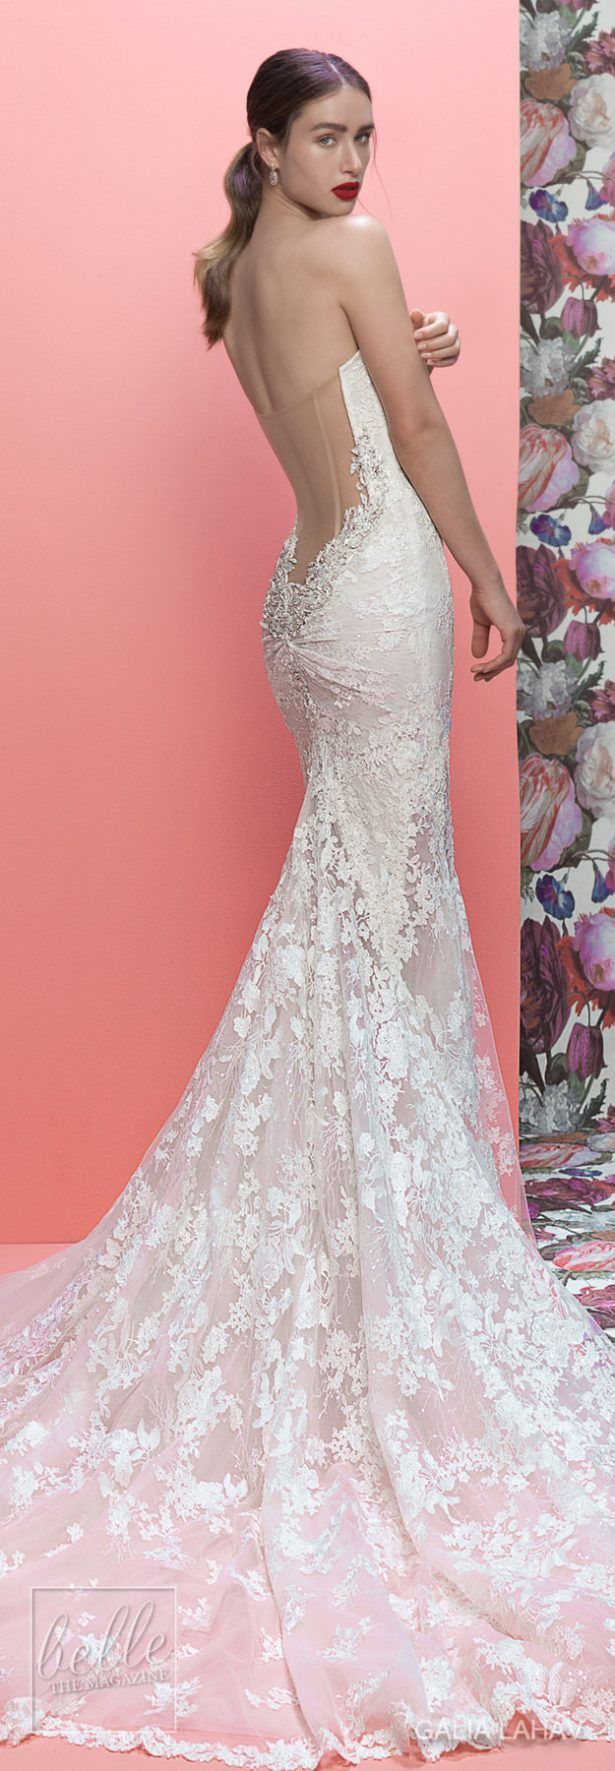 Mejores 1297 imágenes de Wedding Dresses en Pinterest | Vestidos de ...